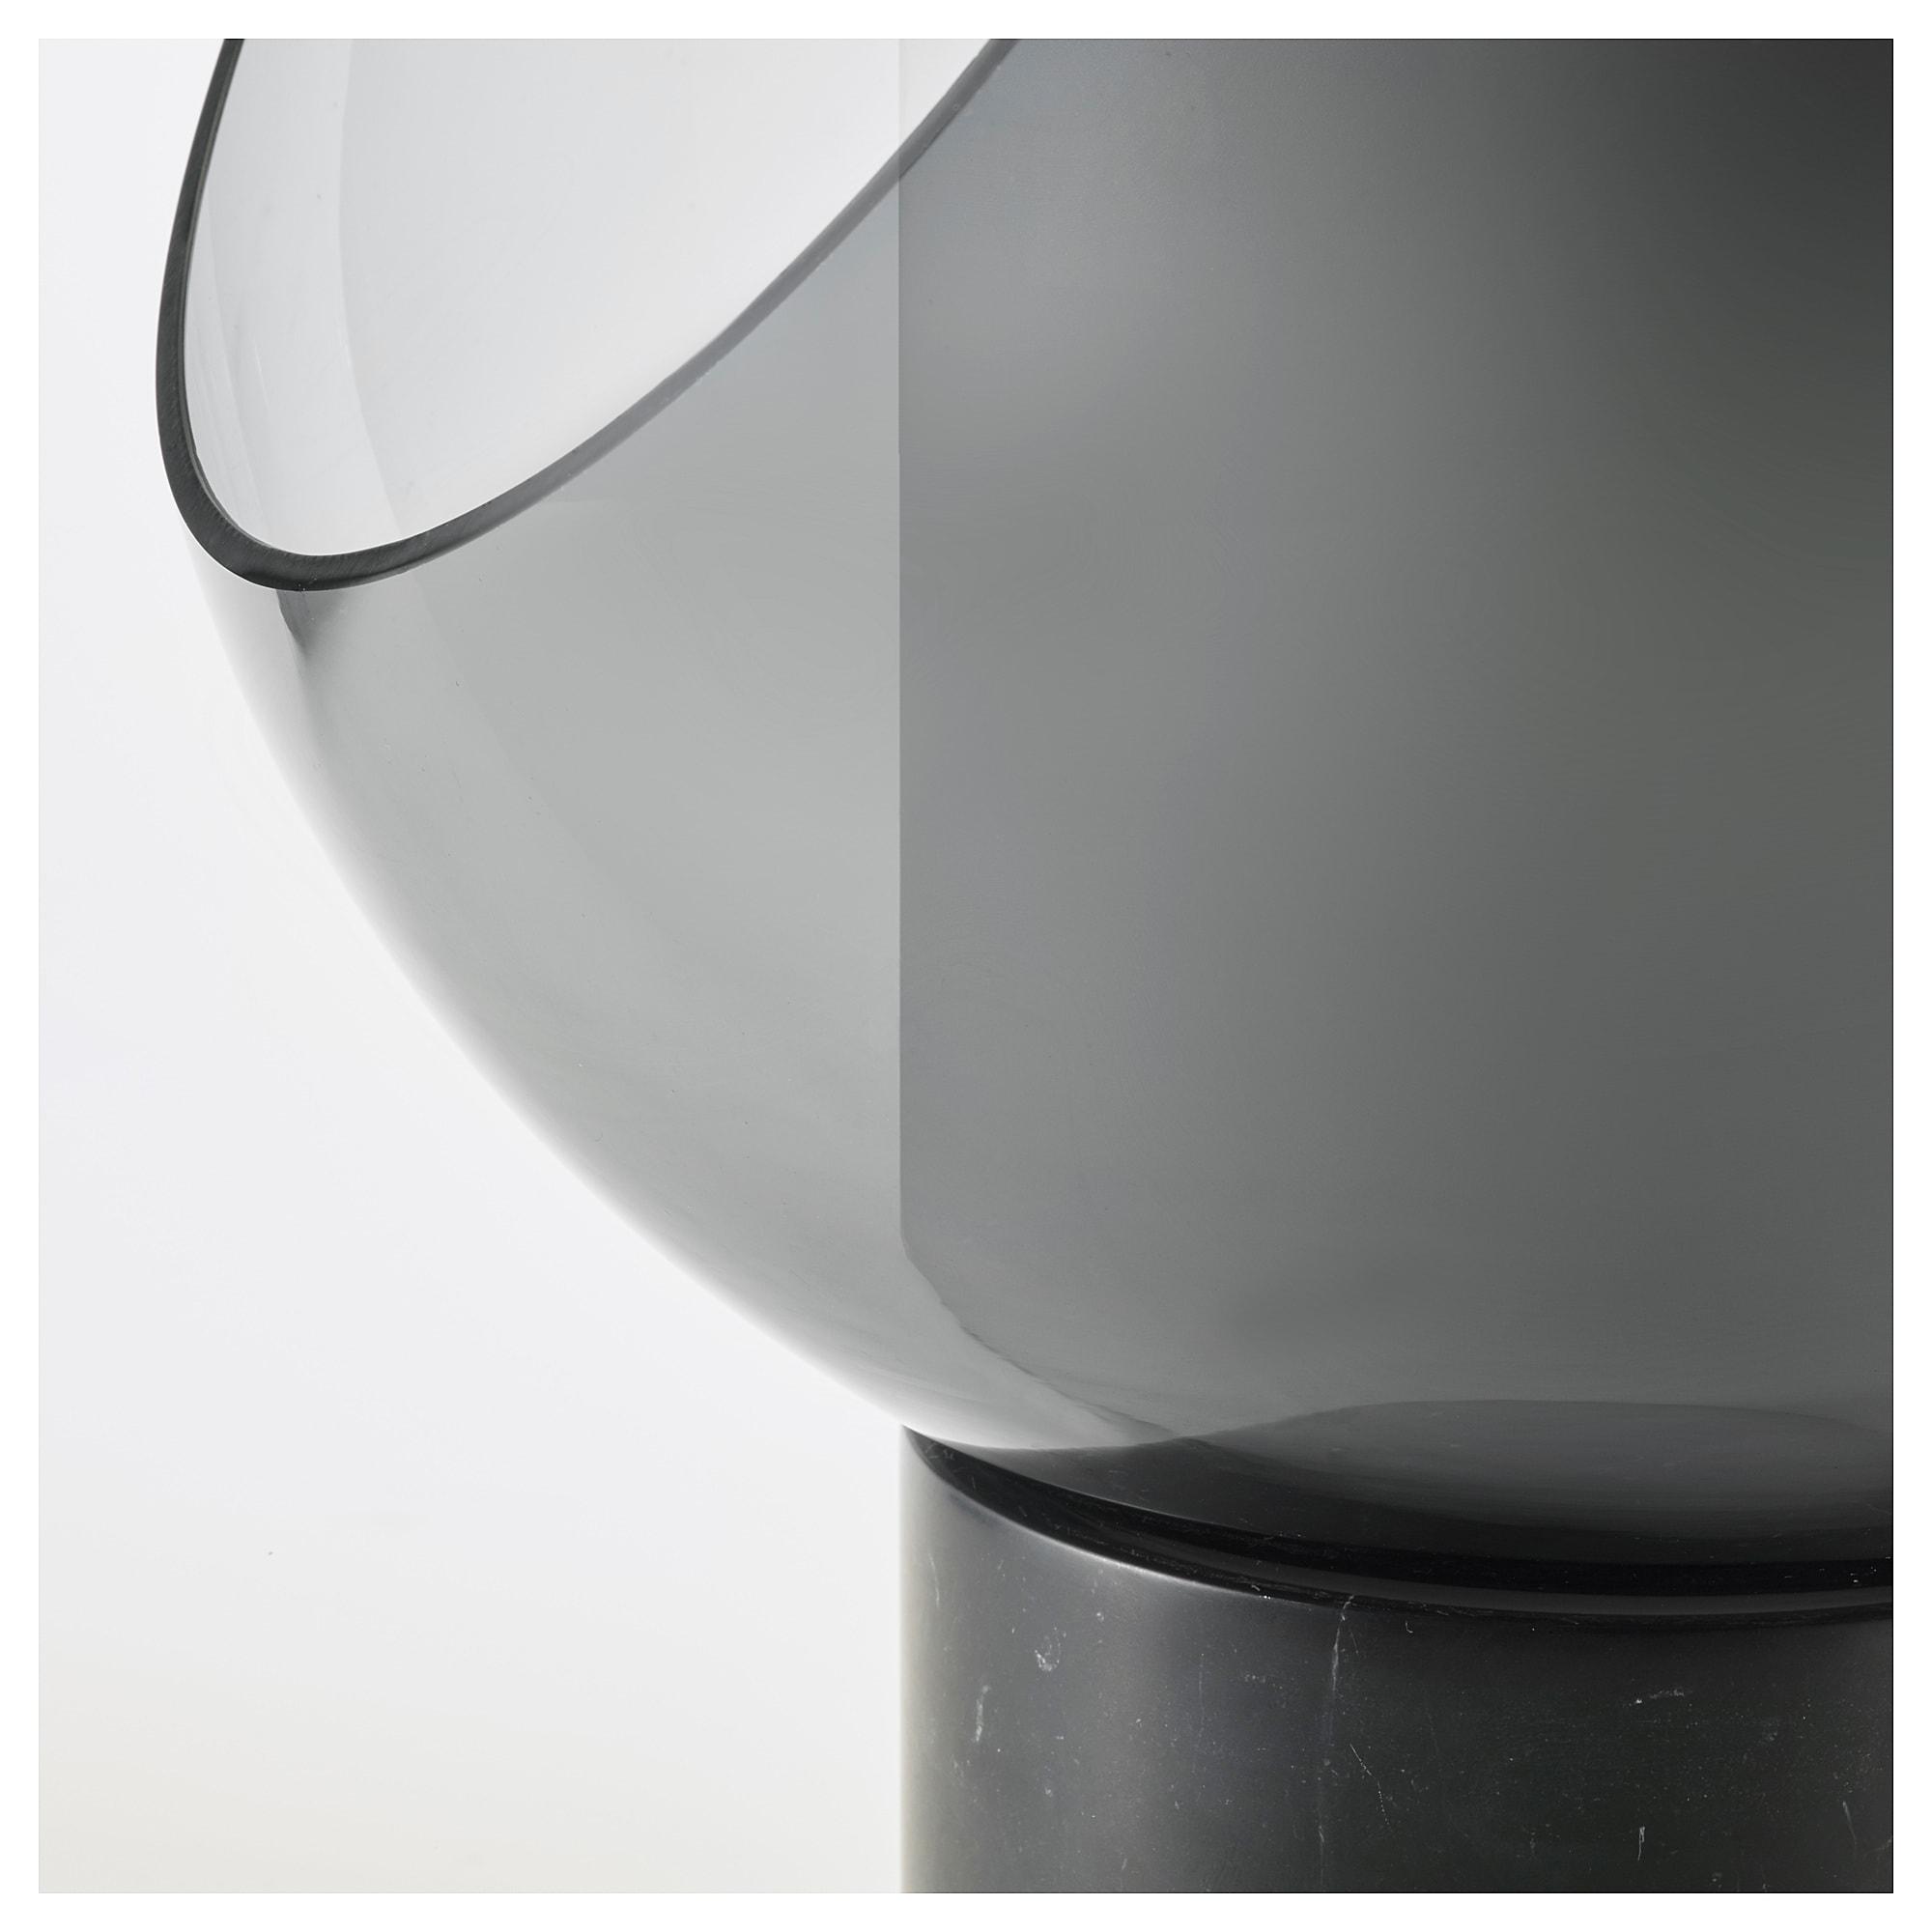 IKEA EVEDAL Table lamp marblegray globe | Table lamp